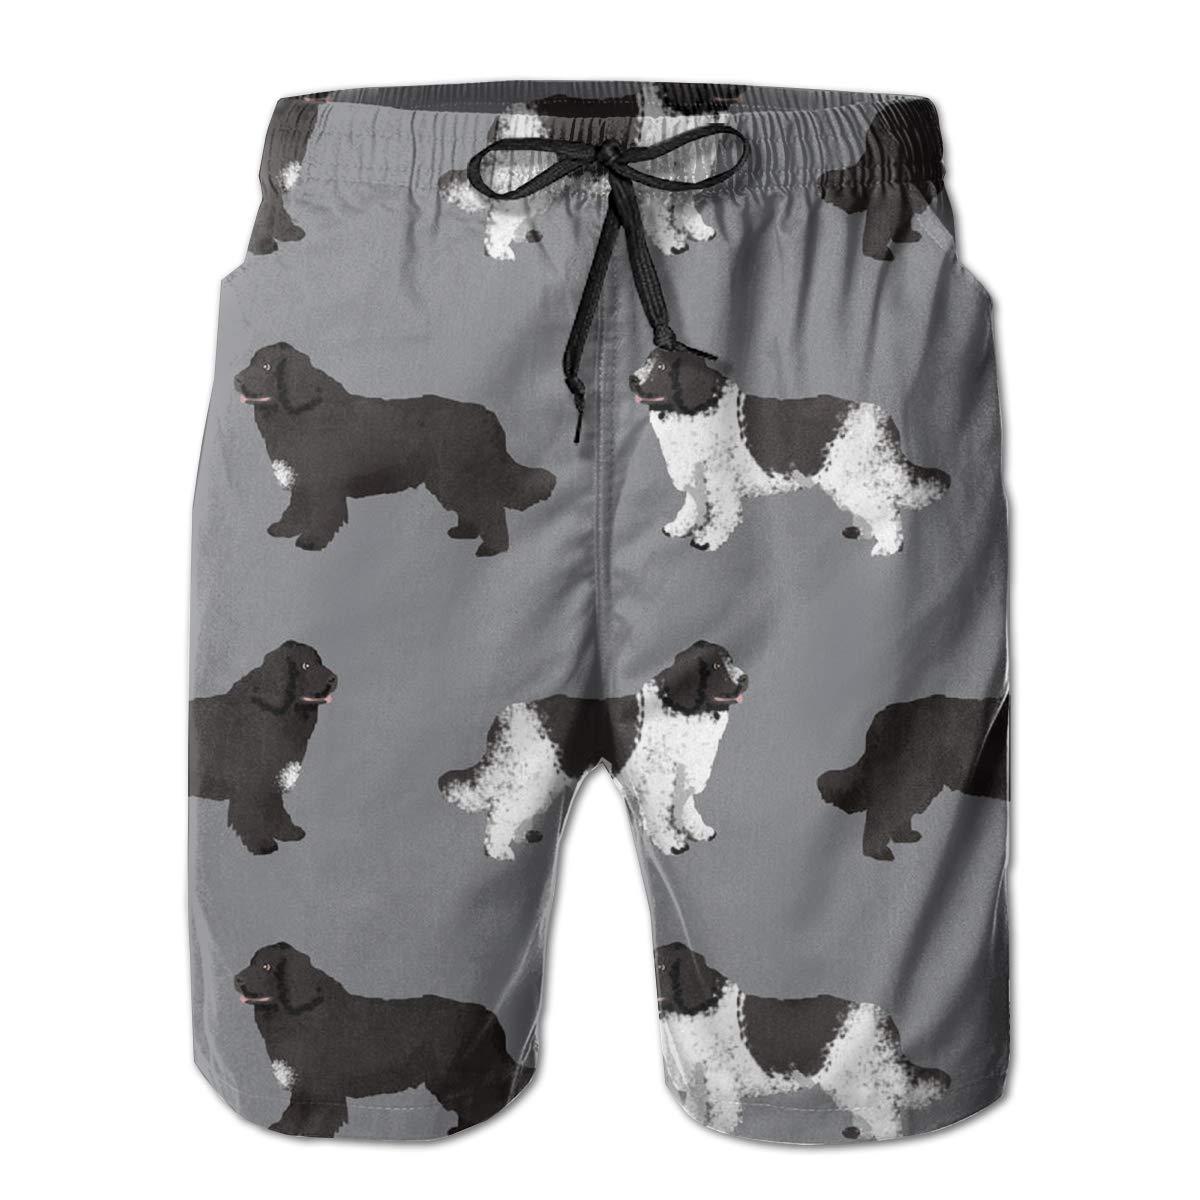 YongColer Boardshort Newfie Dog Boys Teen Quick Dry Sports Trunks